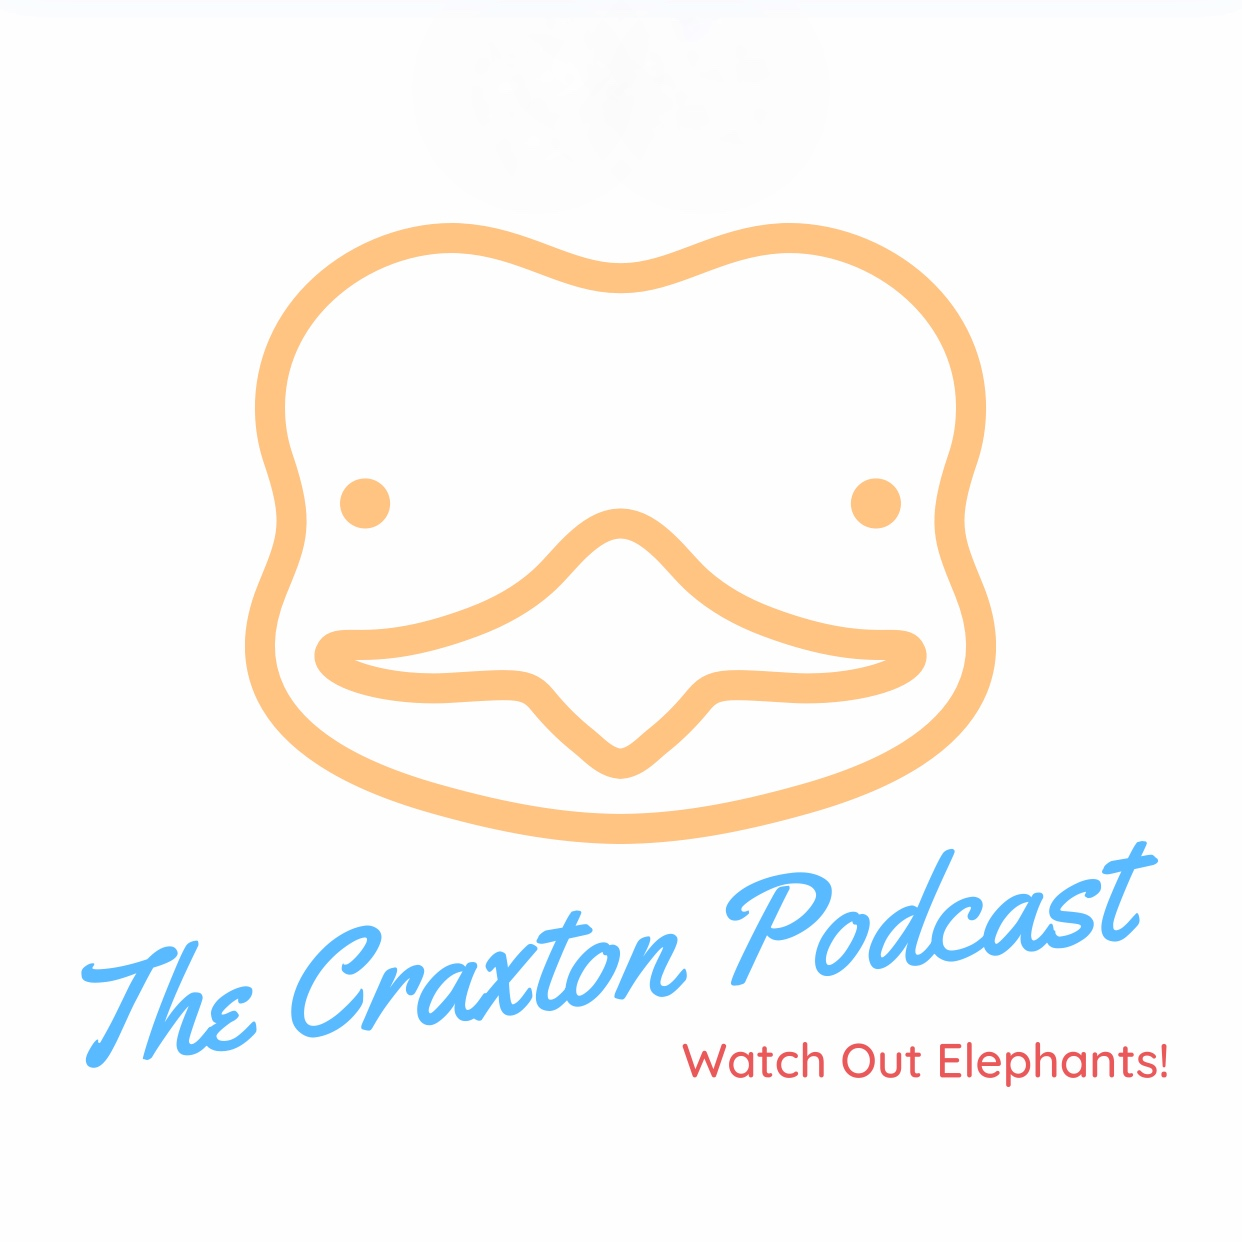 The Craxton Podcast